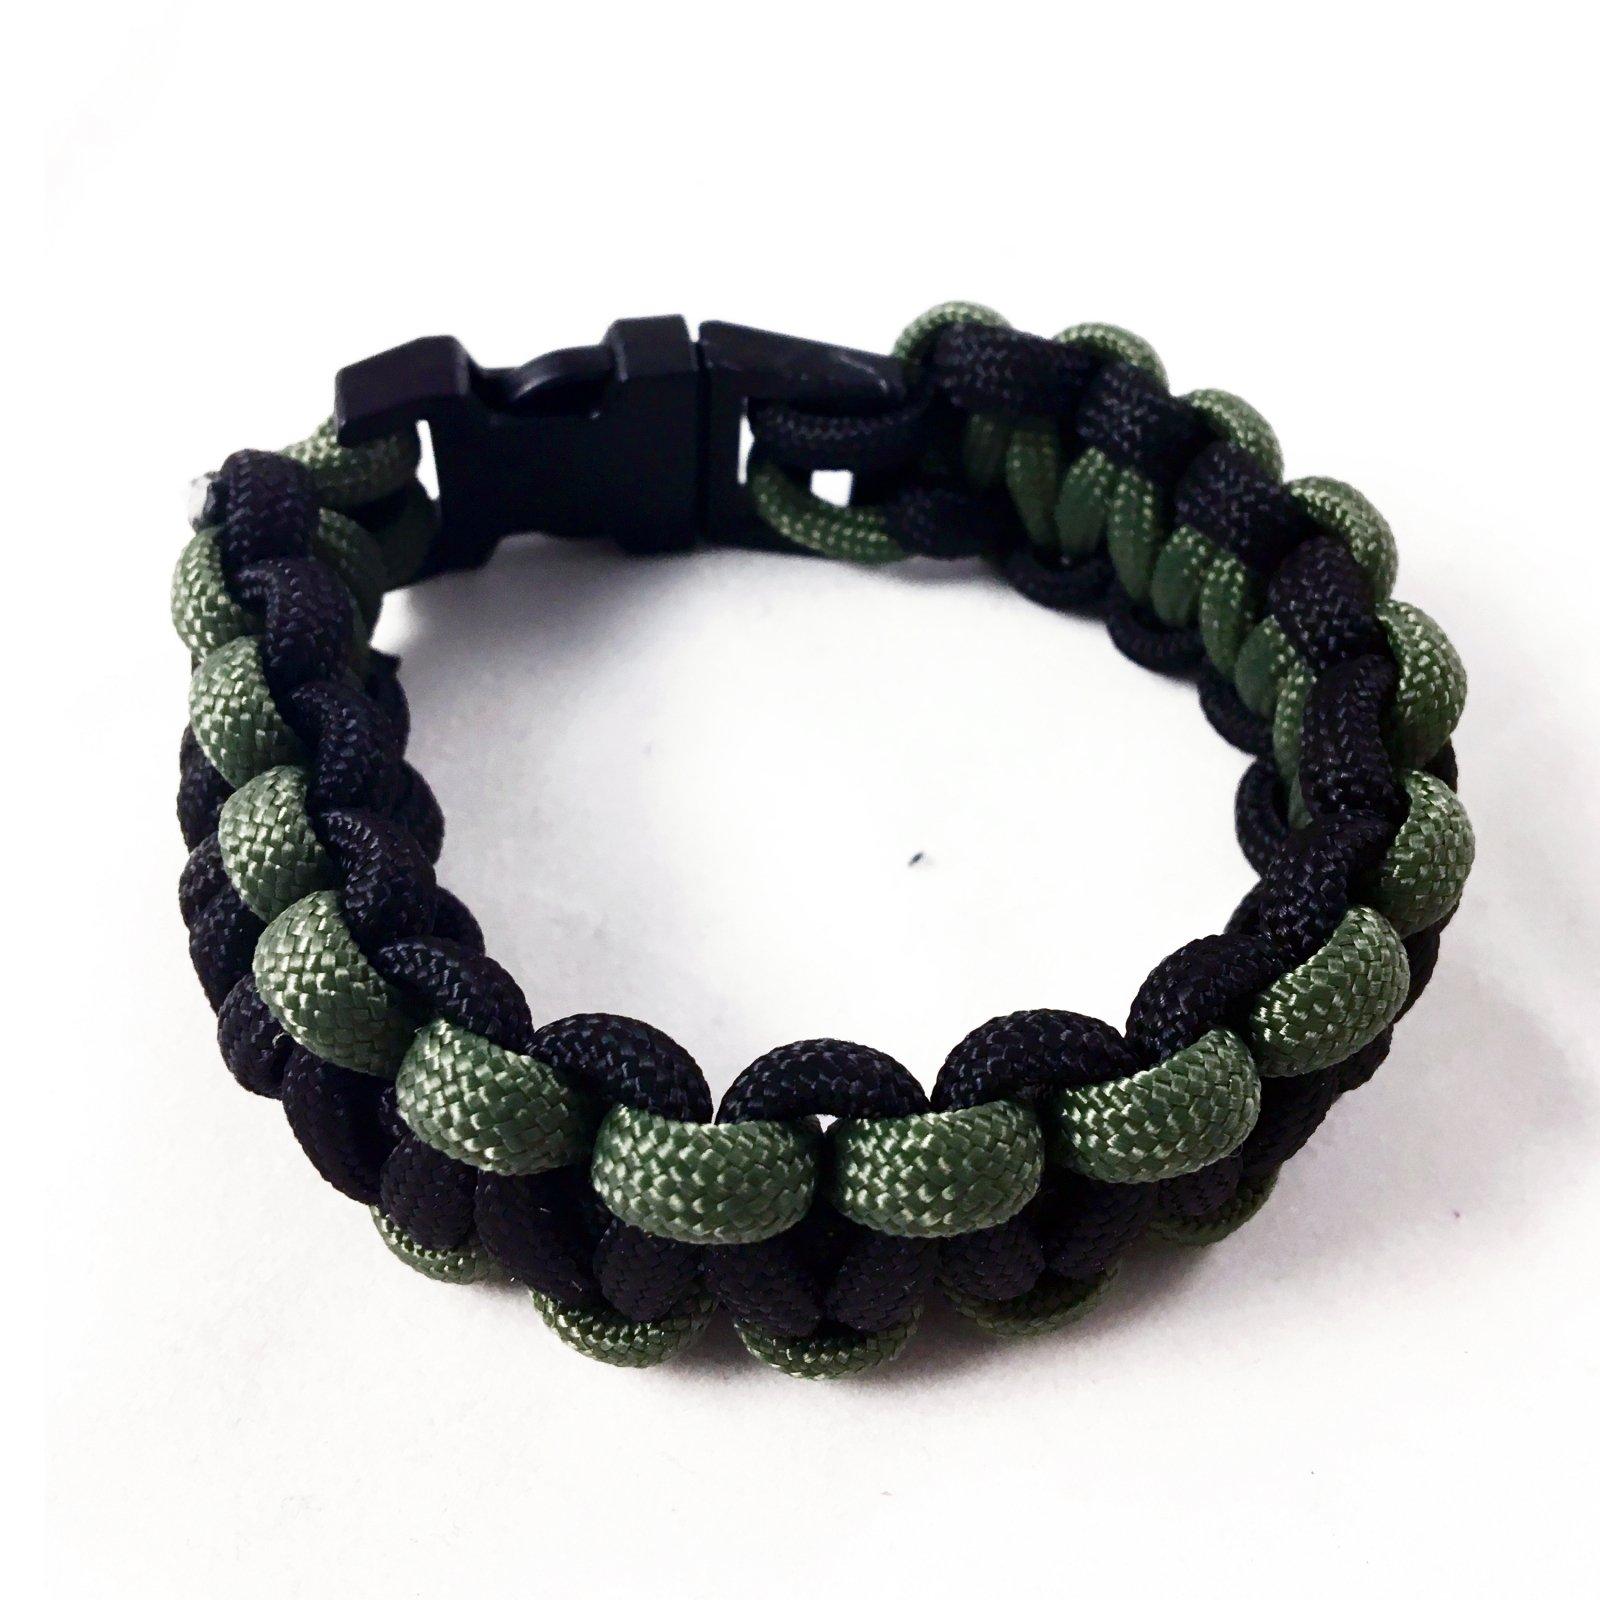 ASR Outdoor - Paracord Bracelet - OD Green and Black